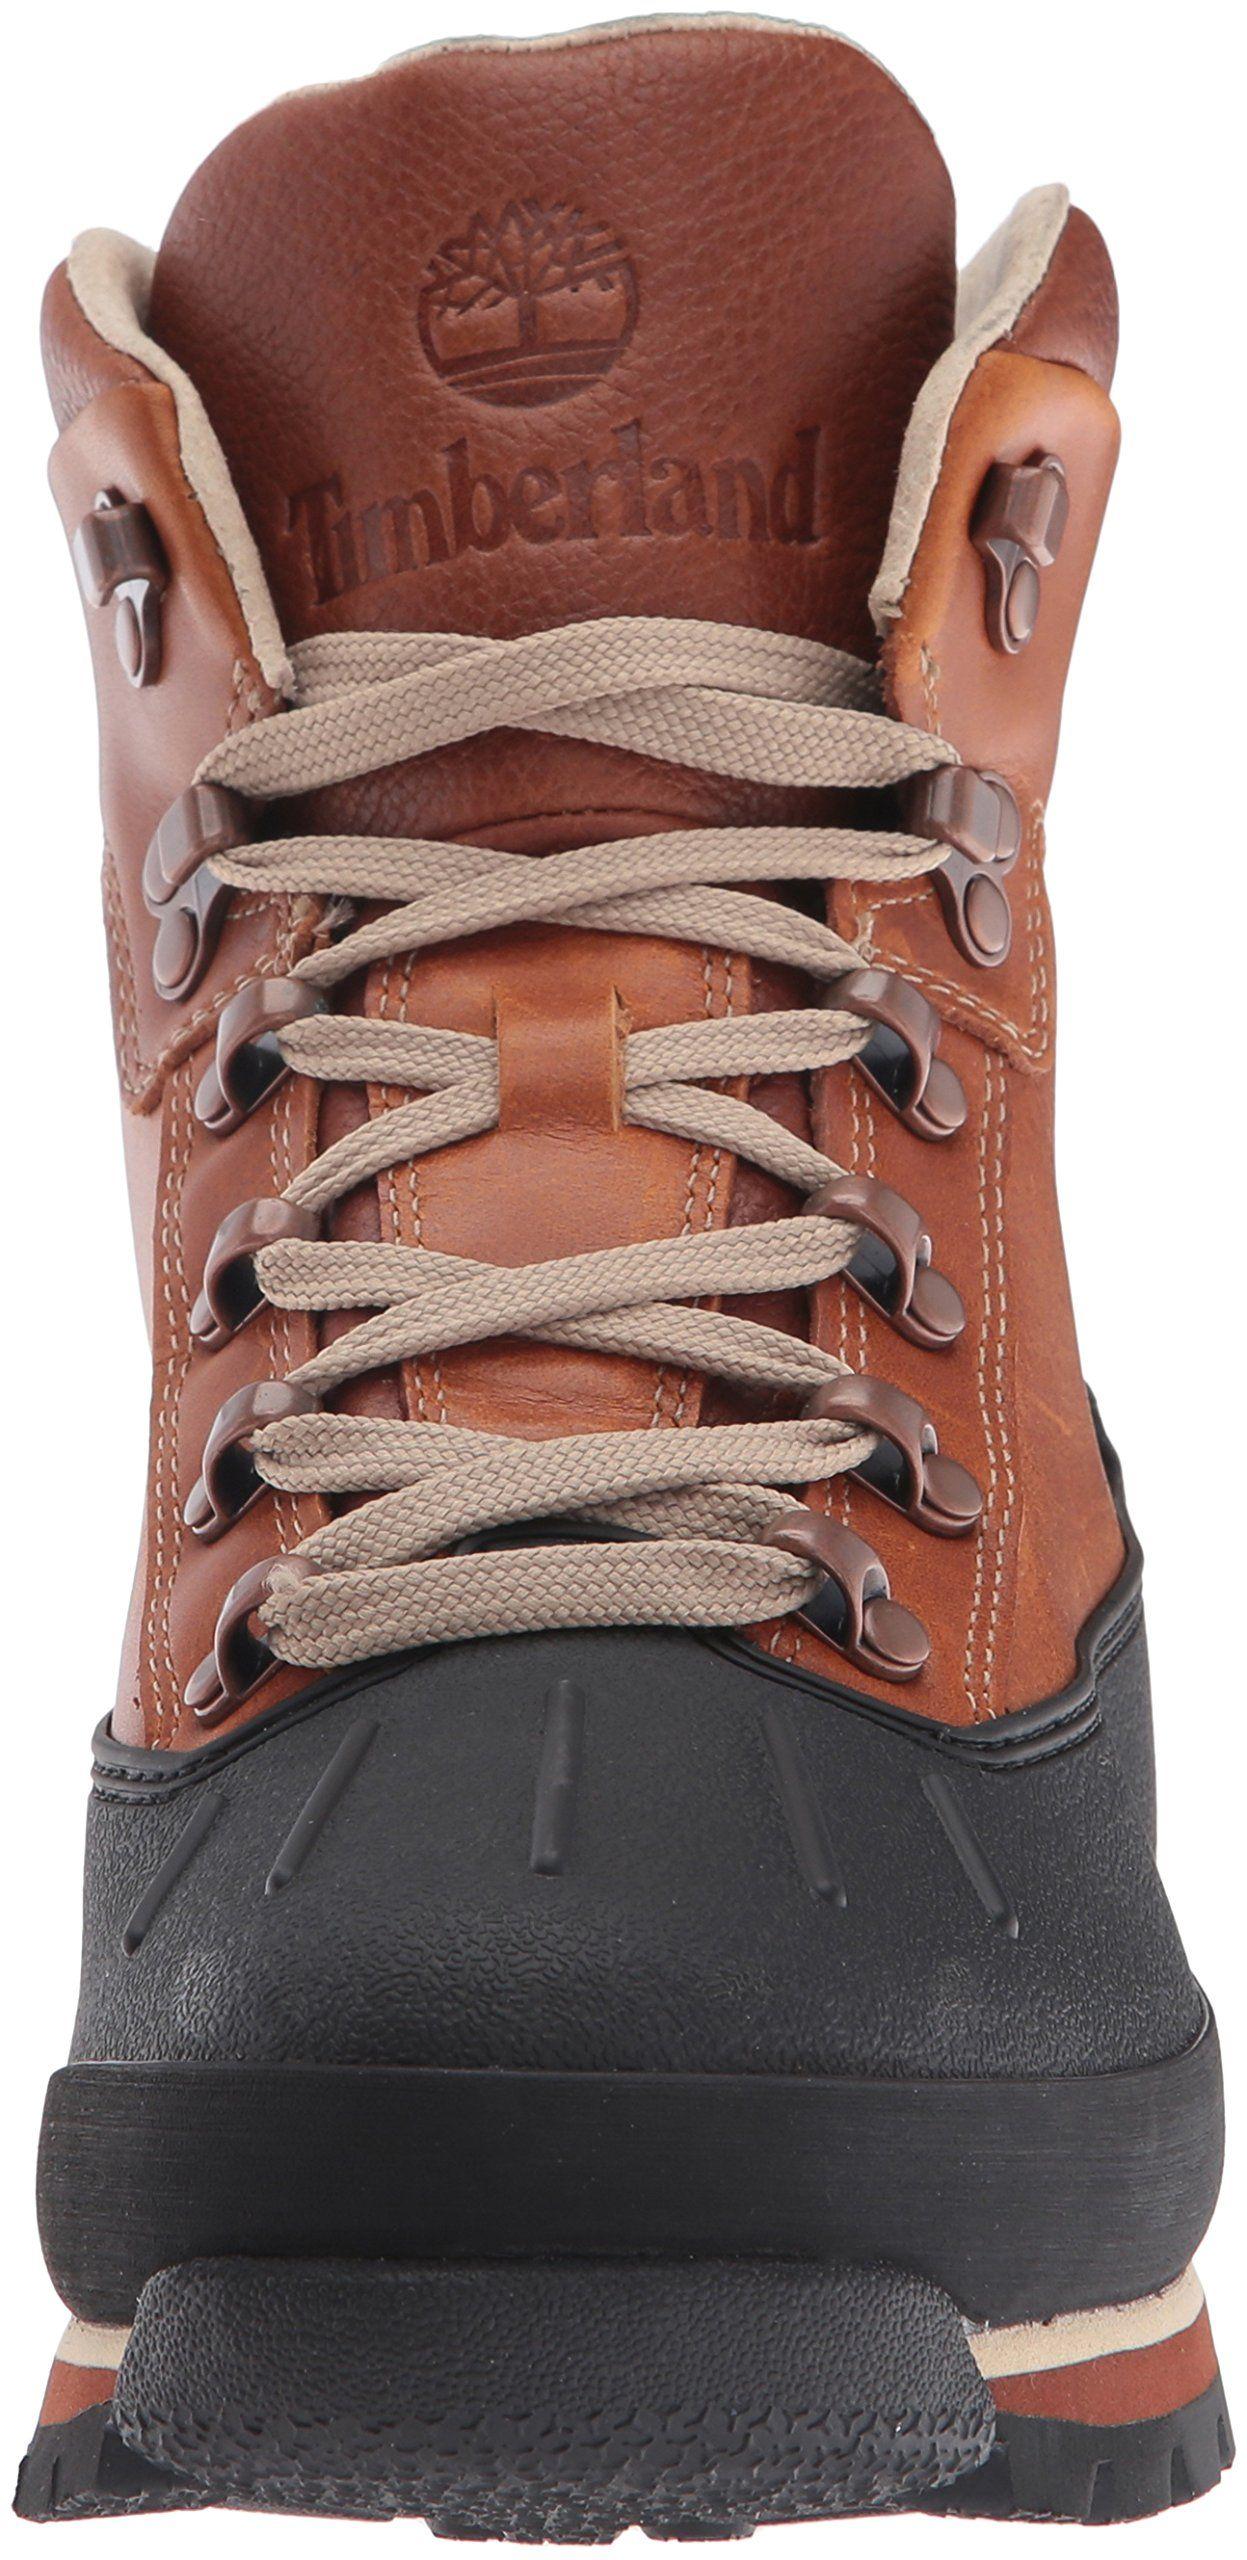 29df17afac6 Timberland Mens EURO Hiker Shell Toe WP Winter Boot Burnt Orange ...